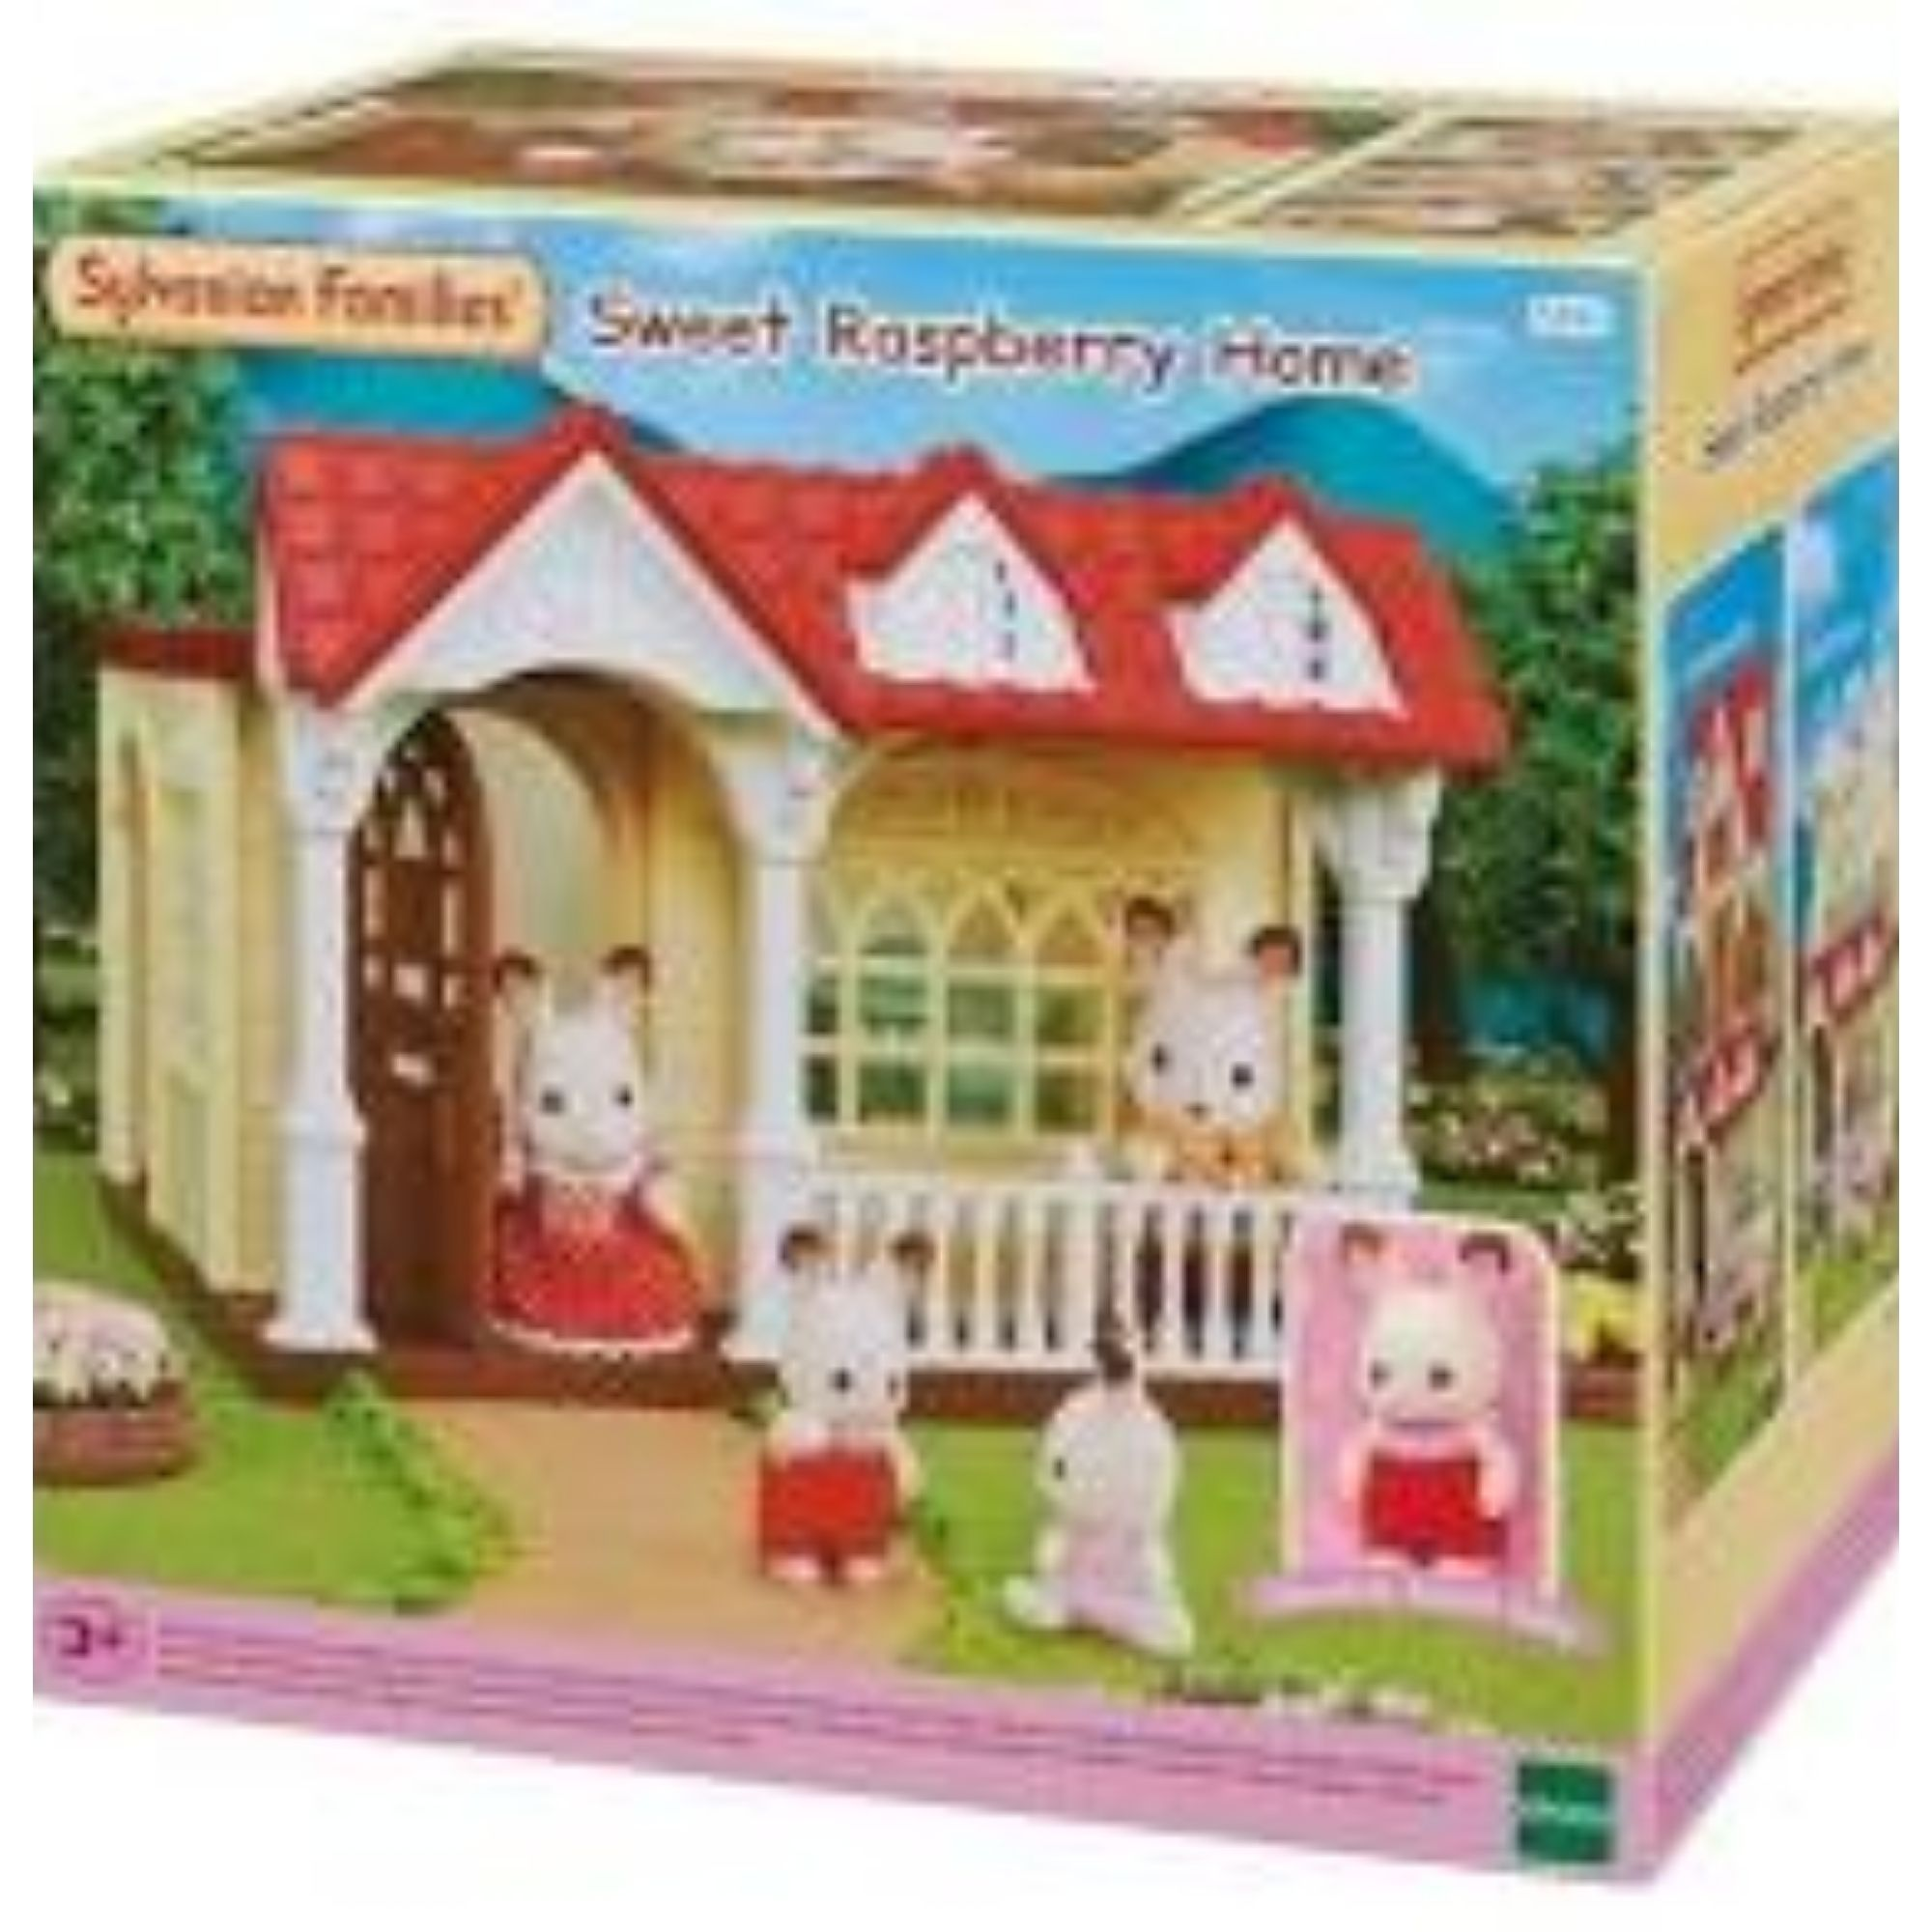 Brinquedo Sylvanian Families Casa Doce Framboesa Epoch 5393  - Game Land Brinquedos